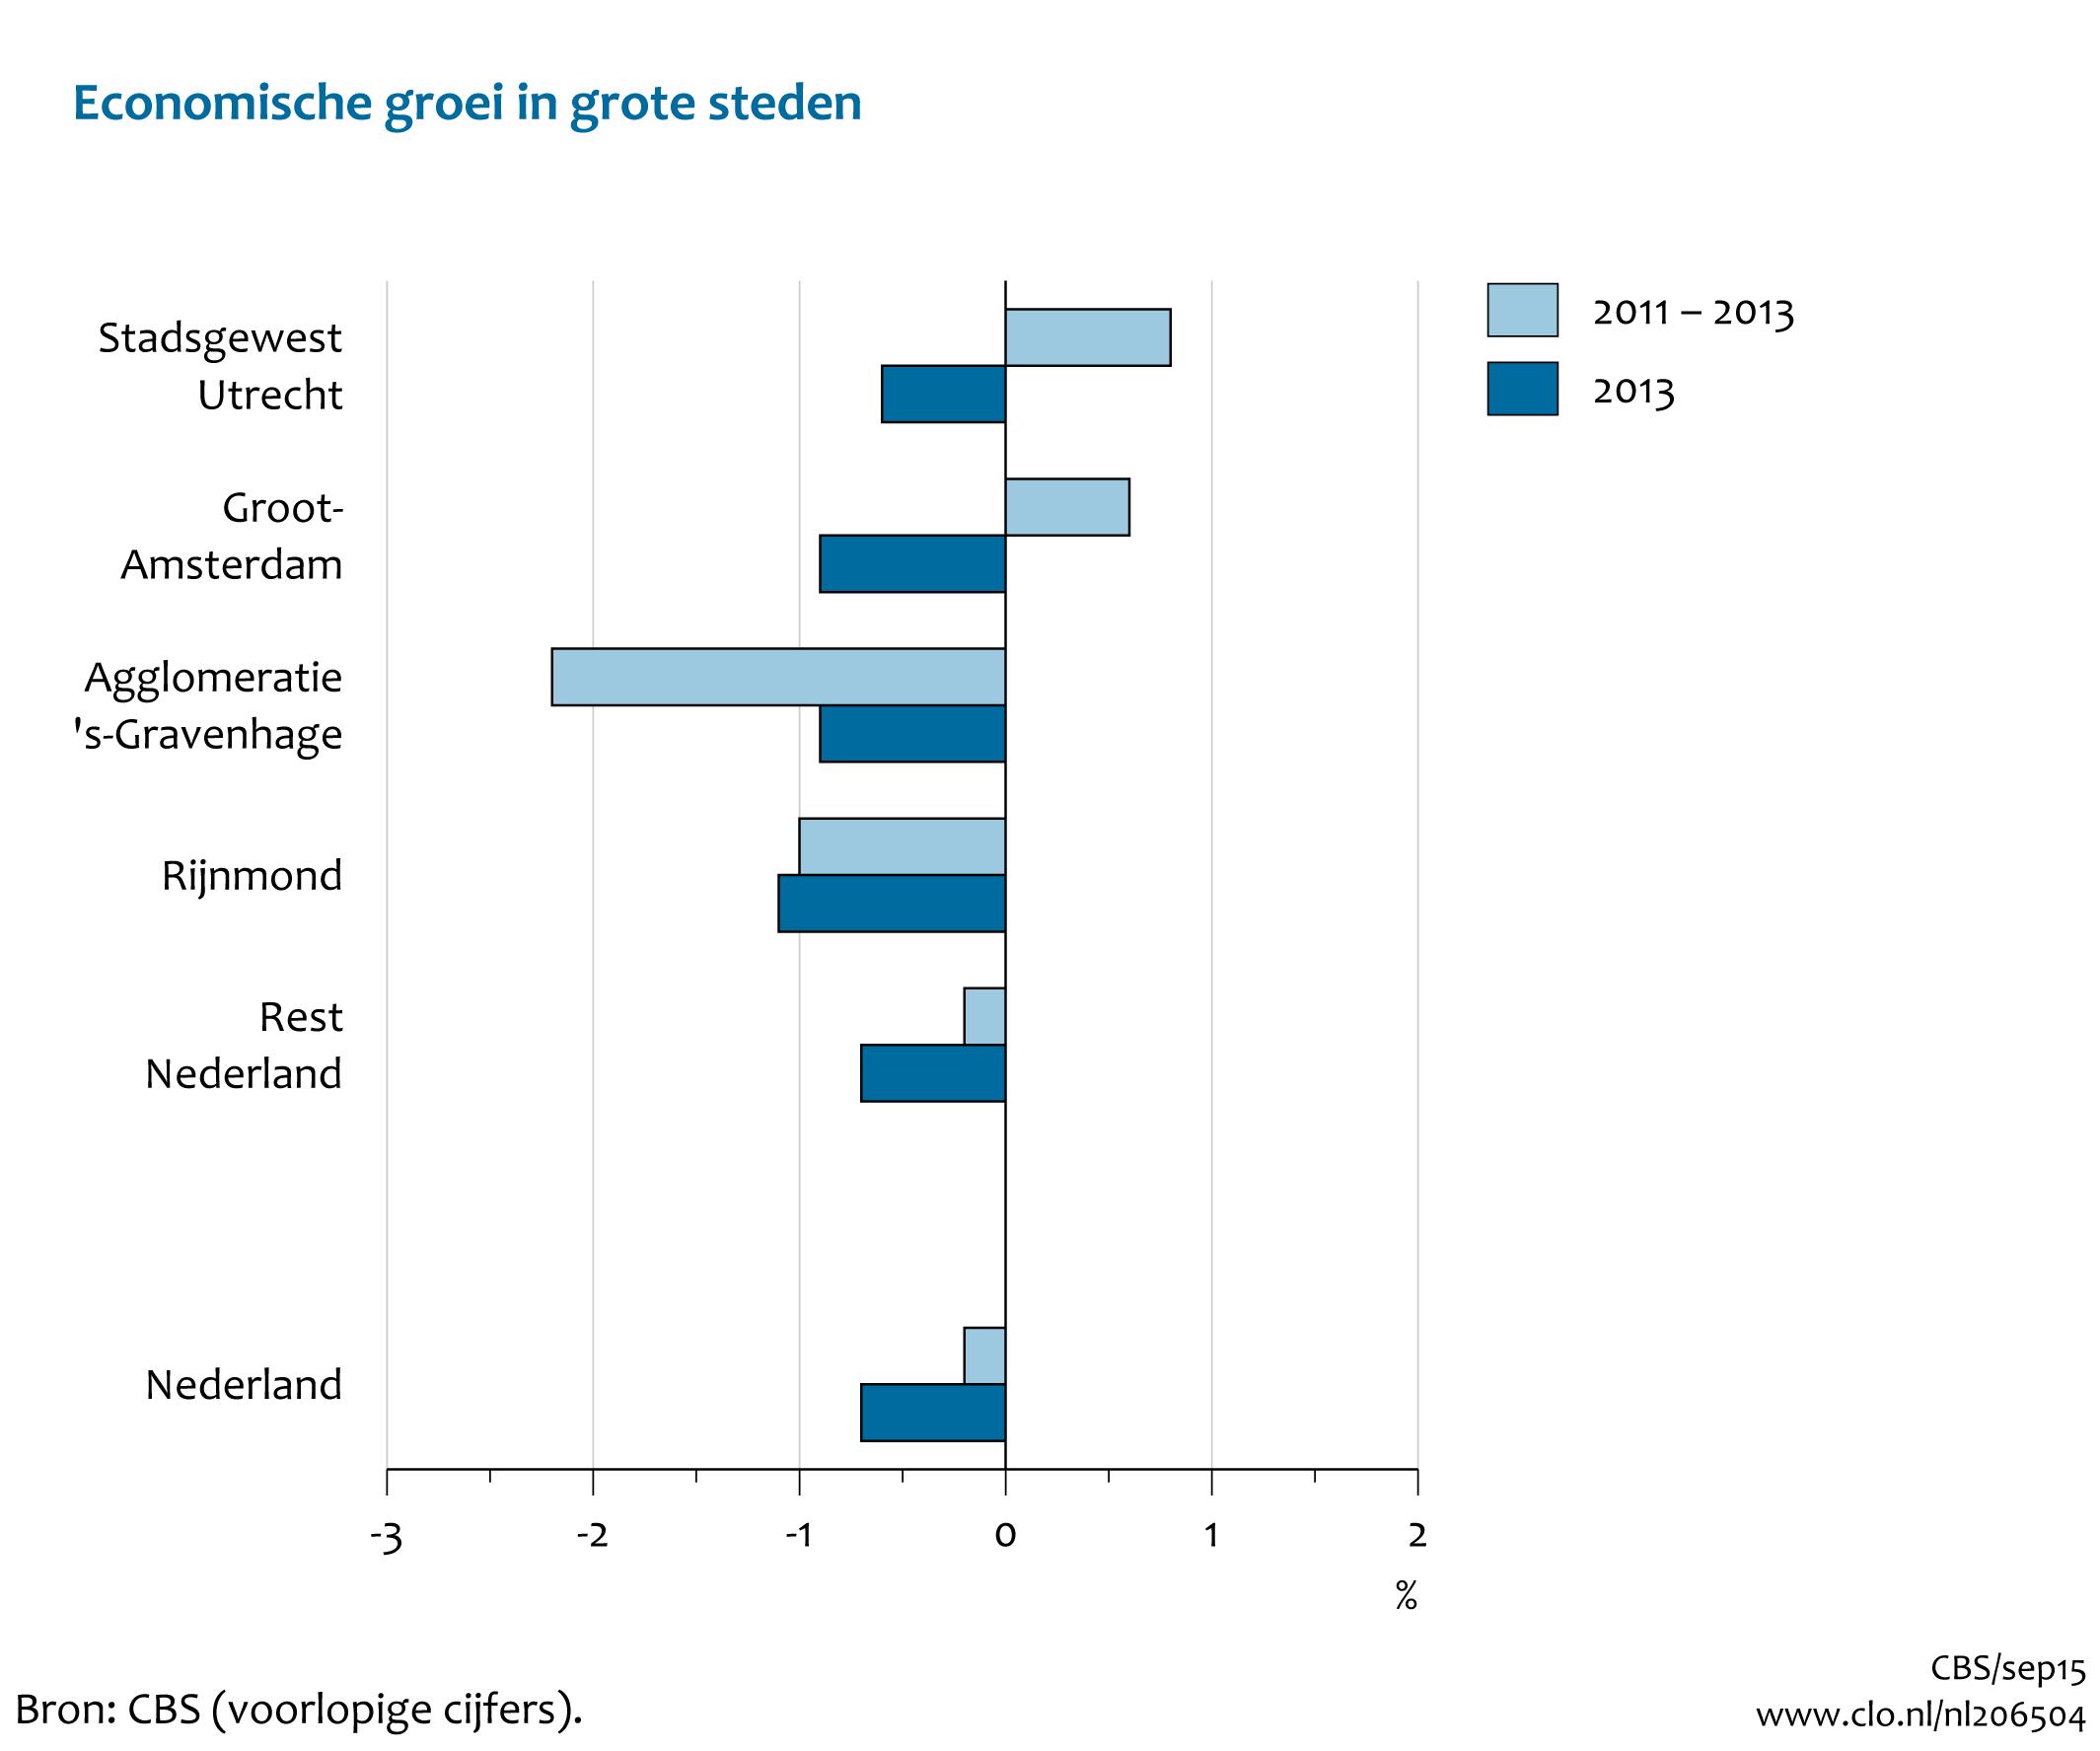 groei bbp nederland